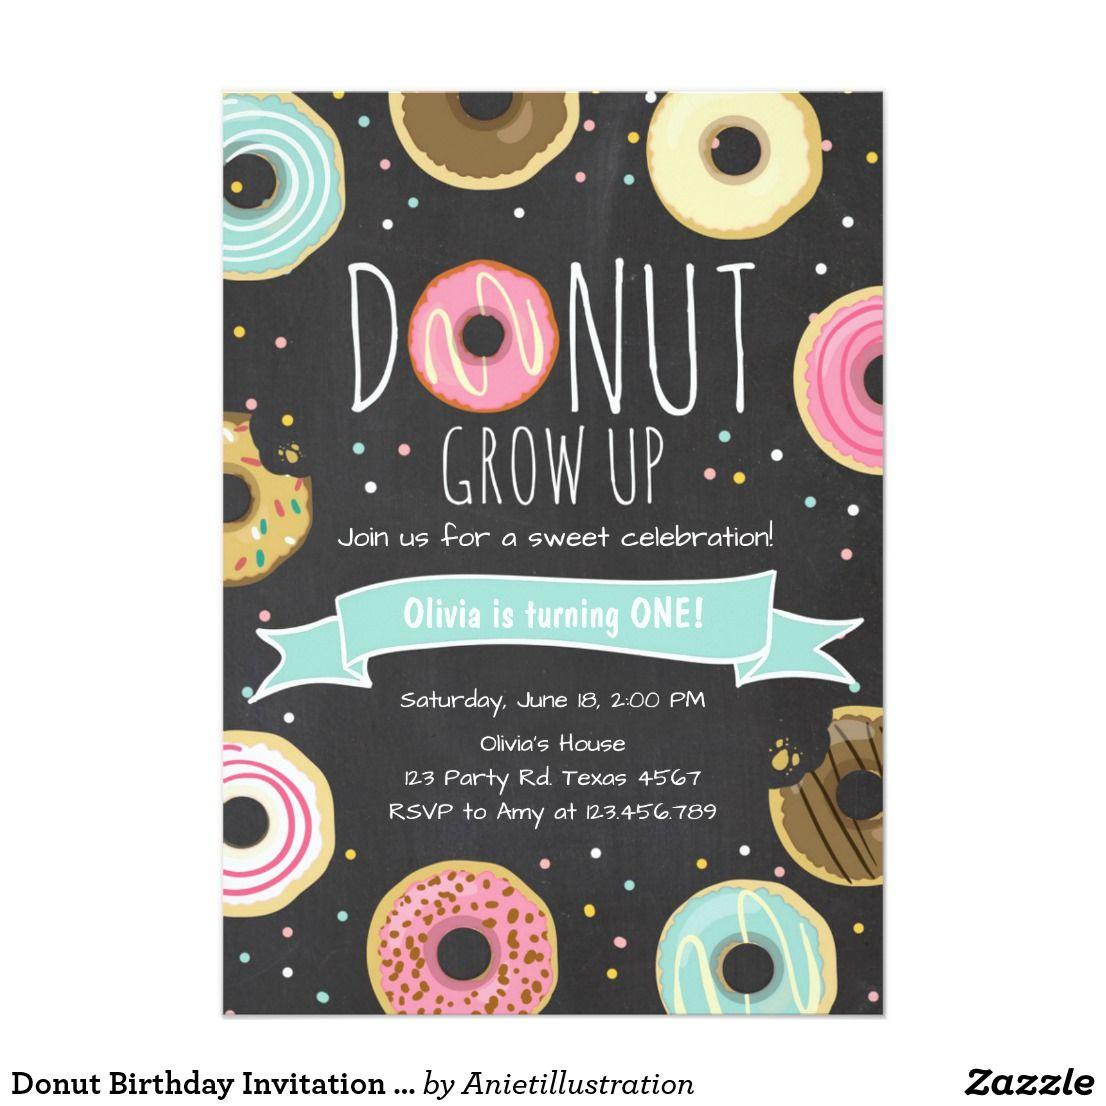 Donut Birthday Invitation Donut Grow Up Party Zazzle Com